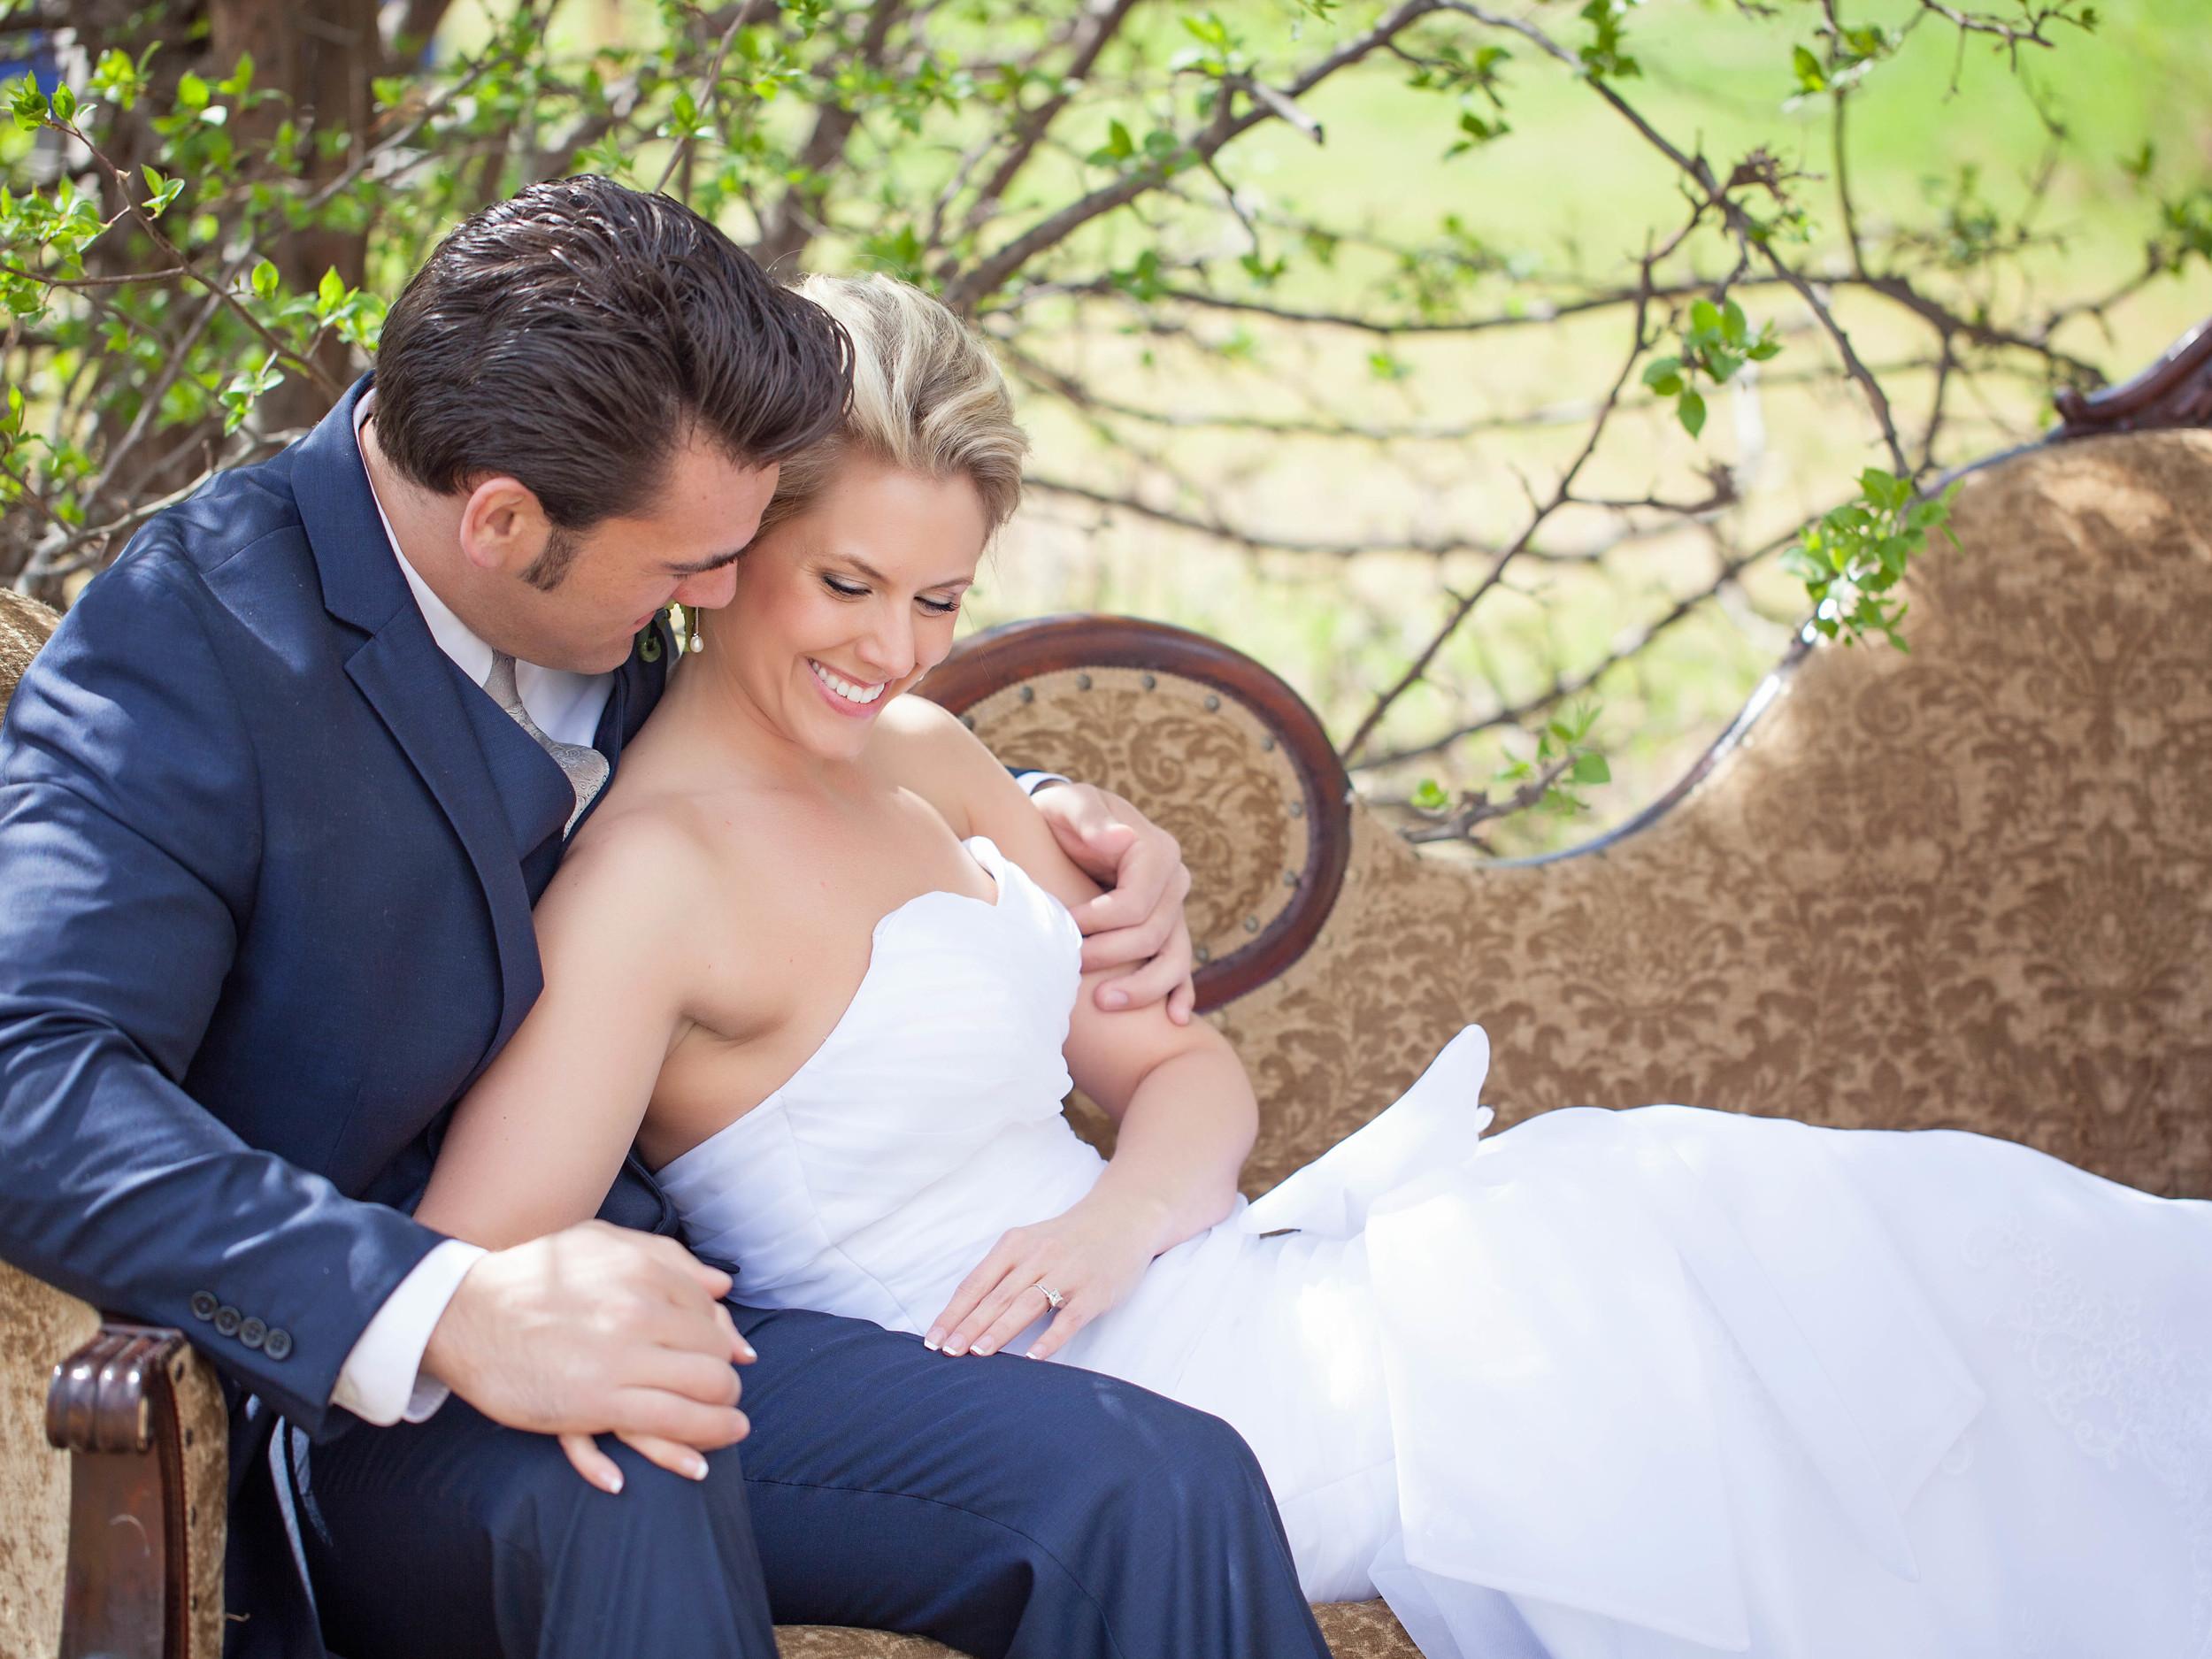 tg-wedding-photogrpahy-16.jpg